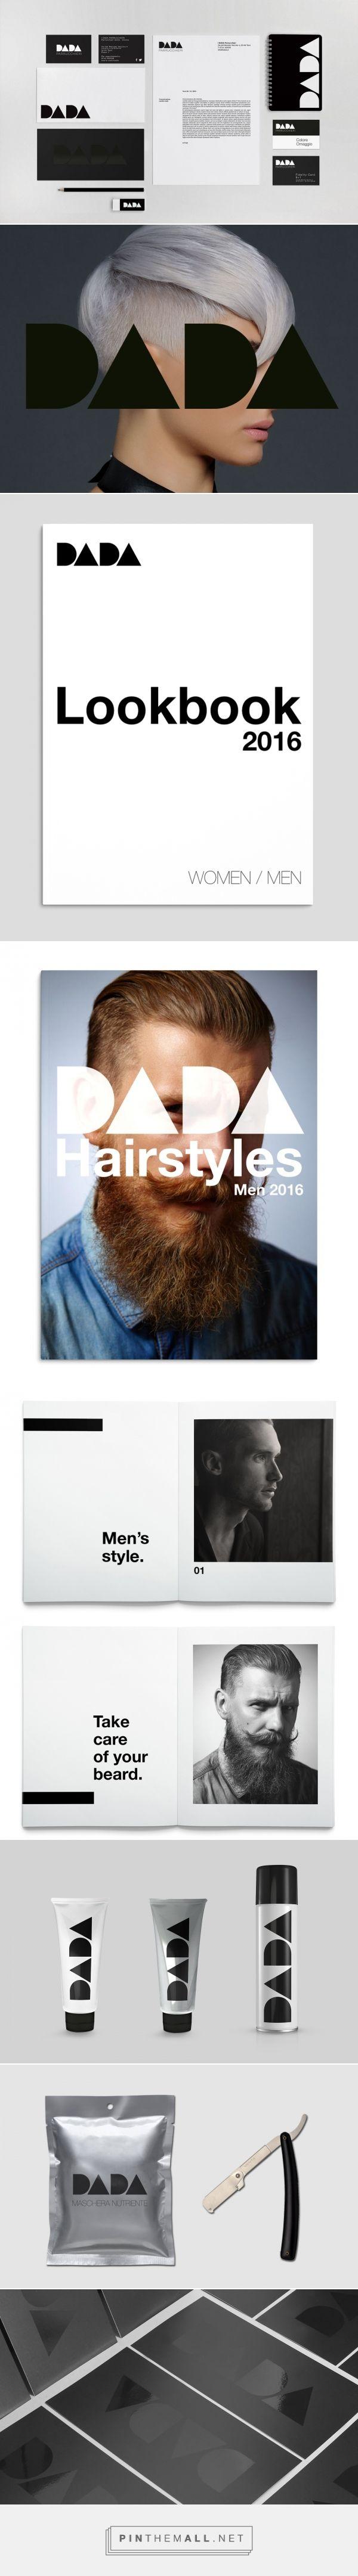 Brand identity DADA Parrucchieri | Bocanegra Design Studio. Identity created for an hairstyle salon.